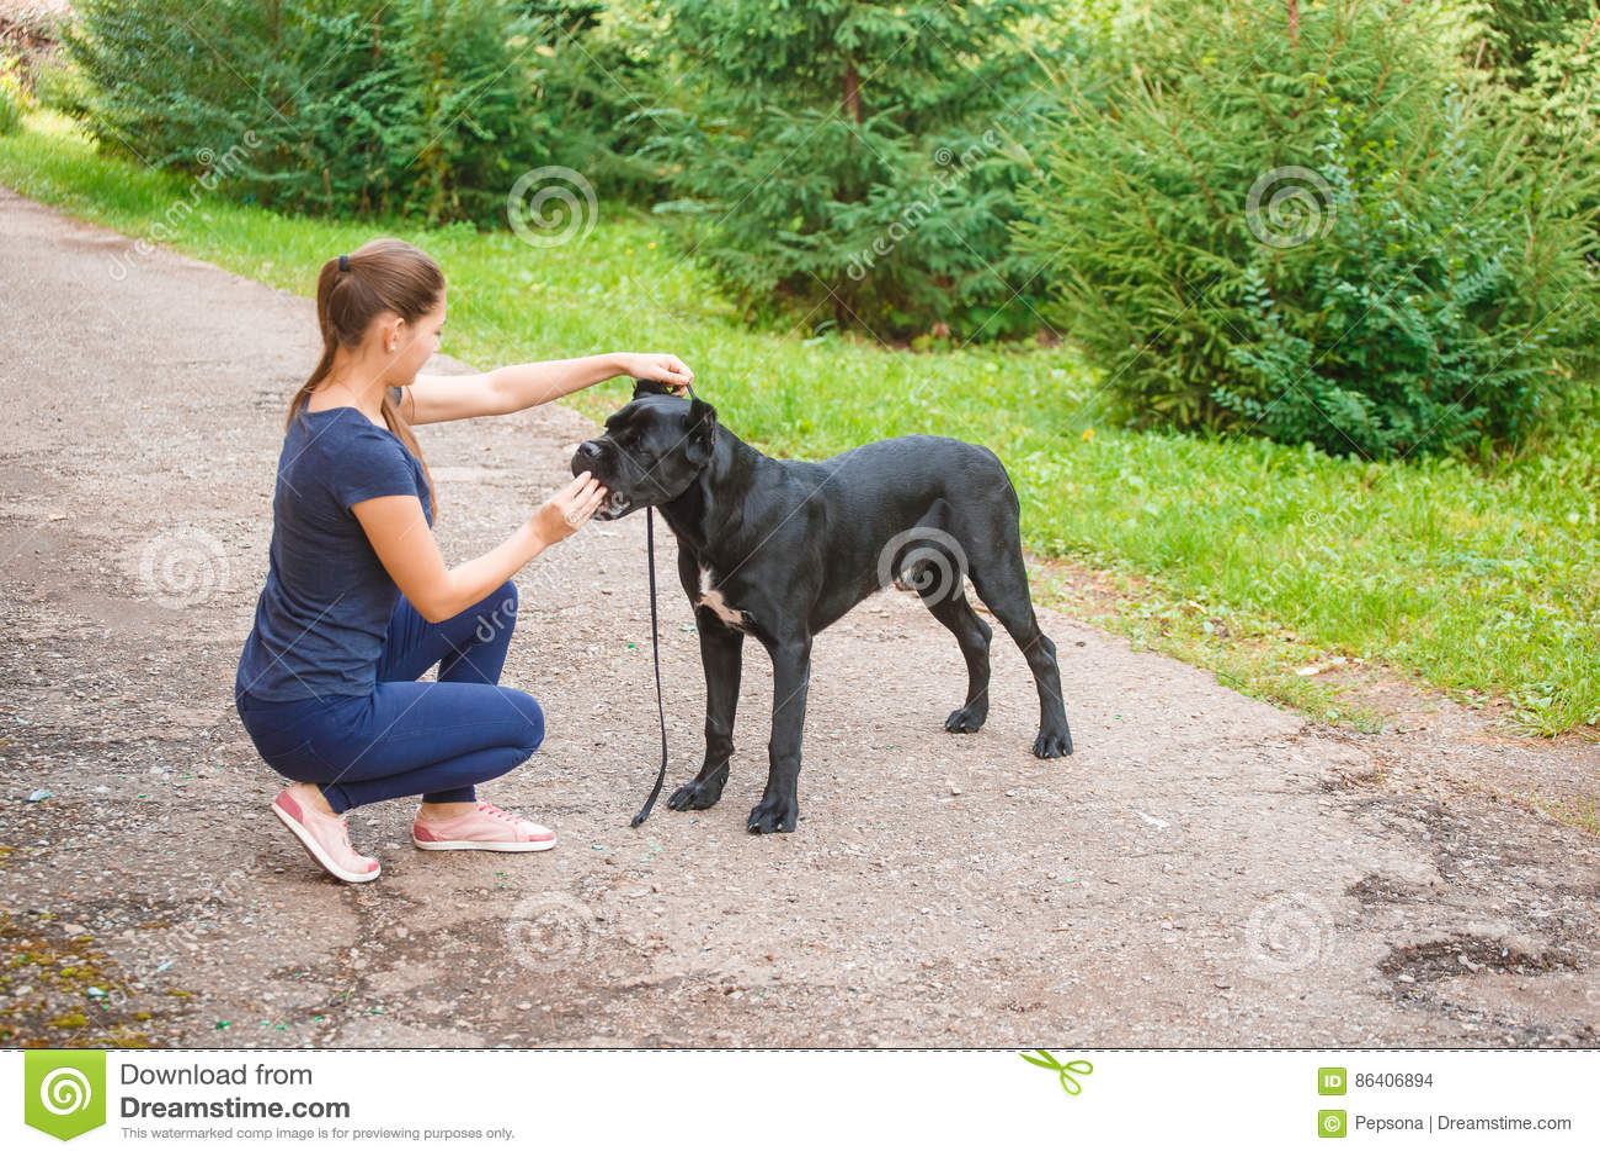 Lenker Mit Einem Hund Cane Corso Italian Mastiff Stockfoto - Bild ...